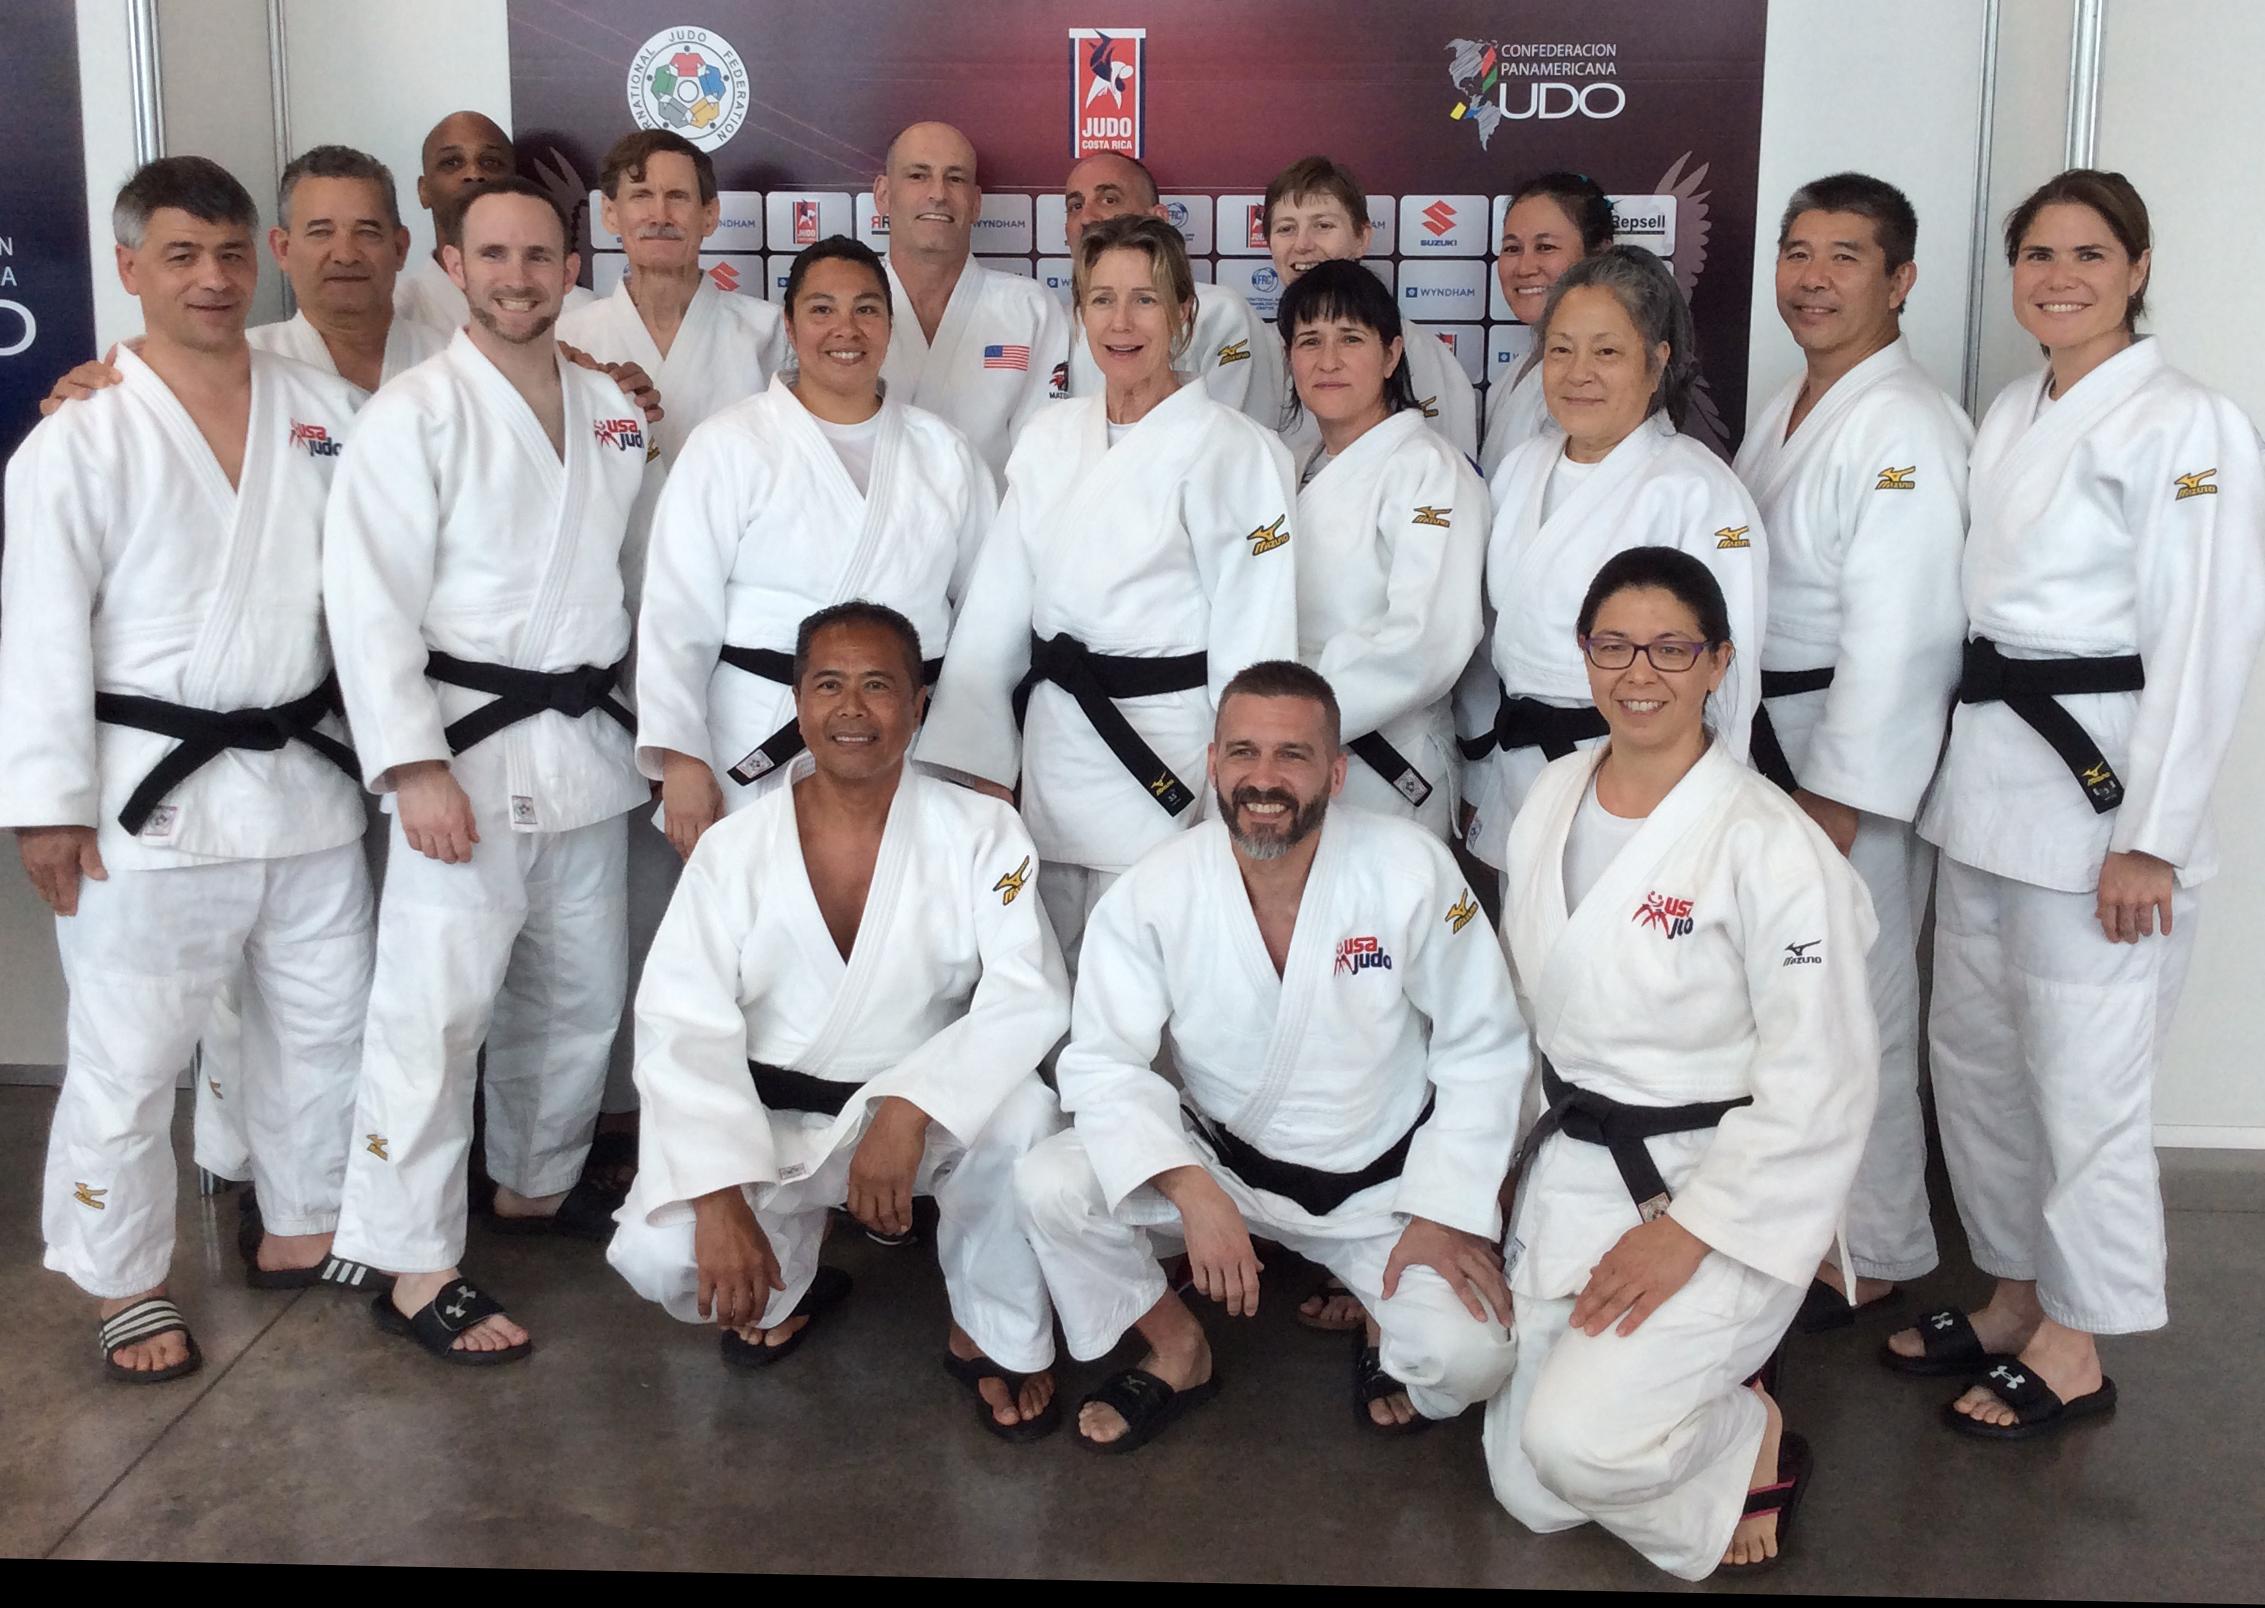 WOW !! Shufu International Kata Team Brings Home the Golds